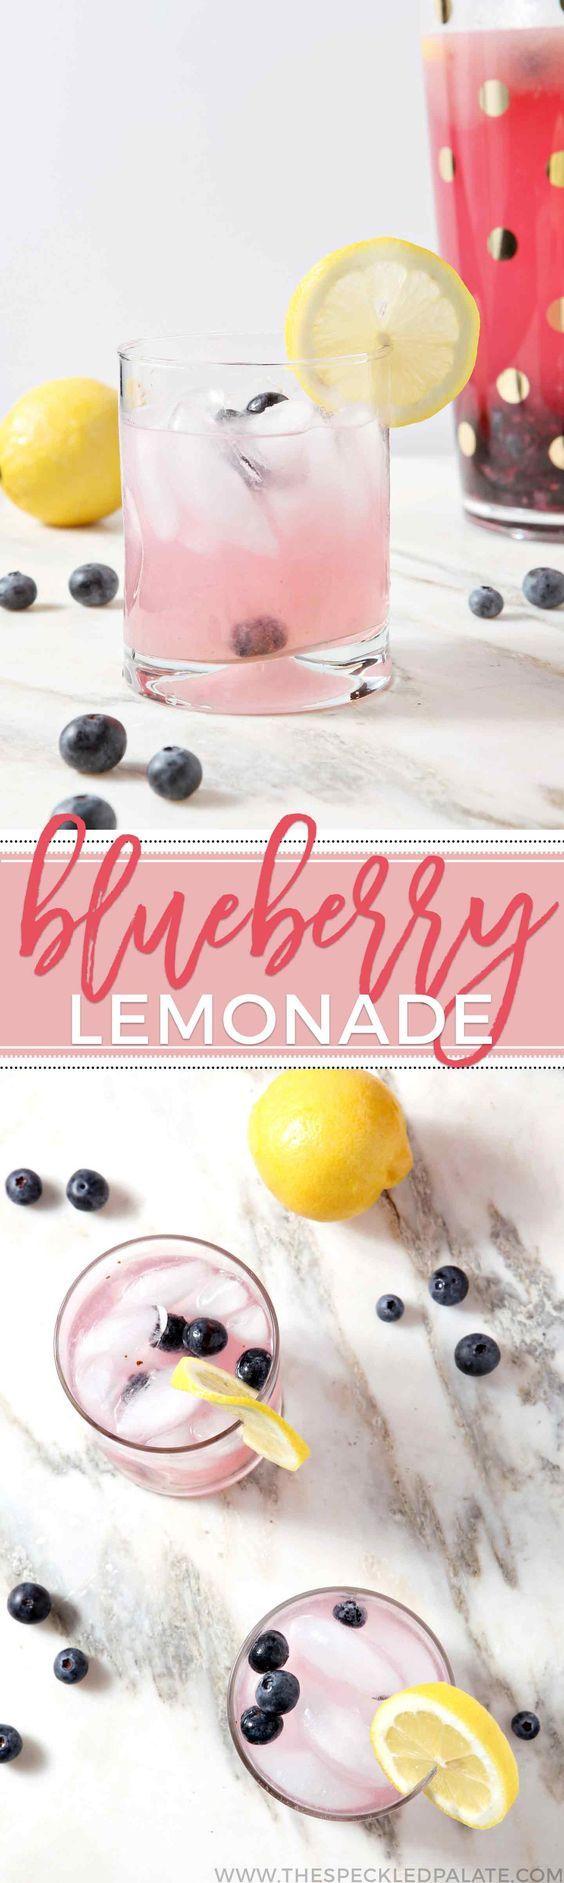 (6) Large Batch Blueberry Lemonade | Recipe